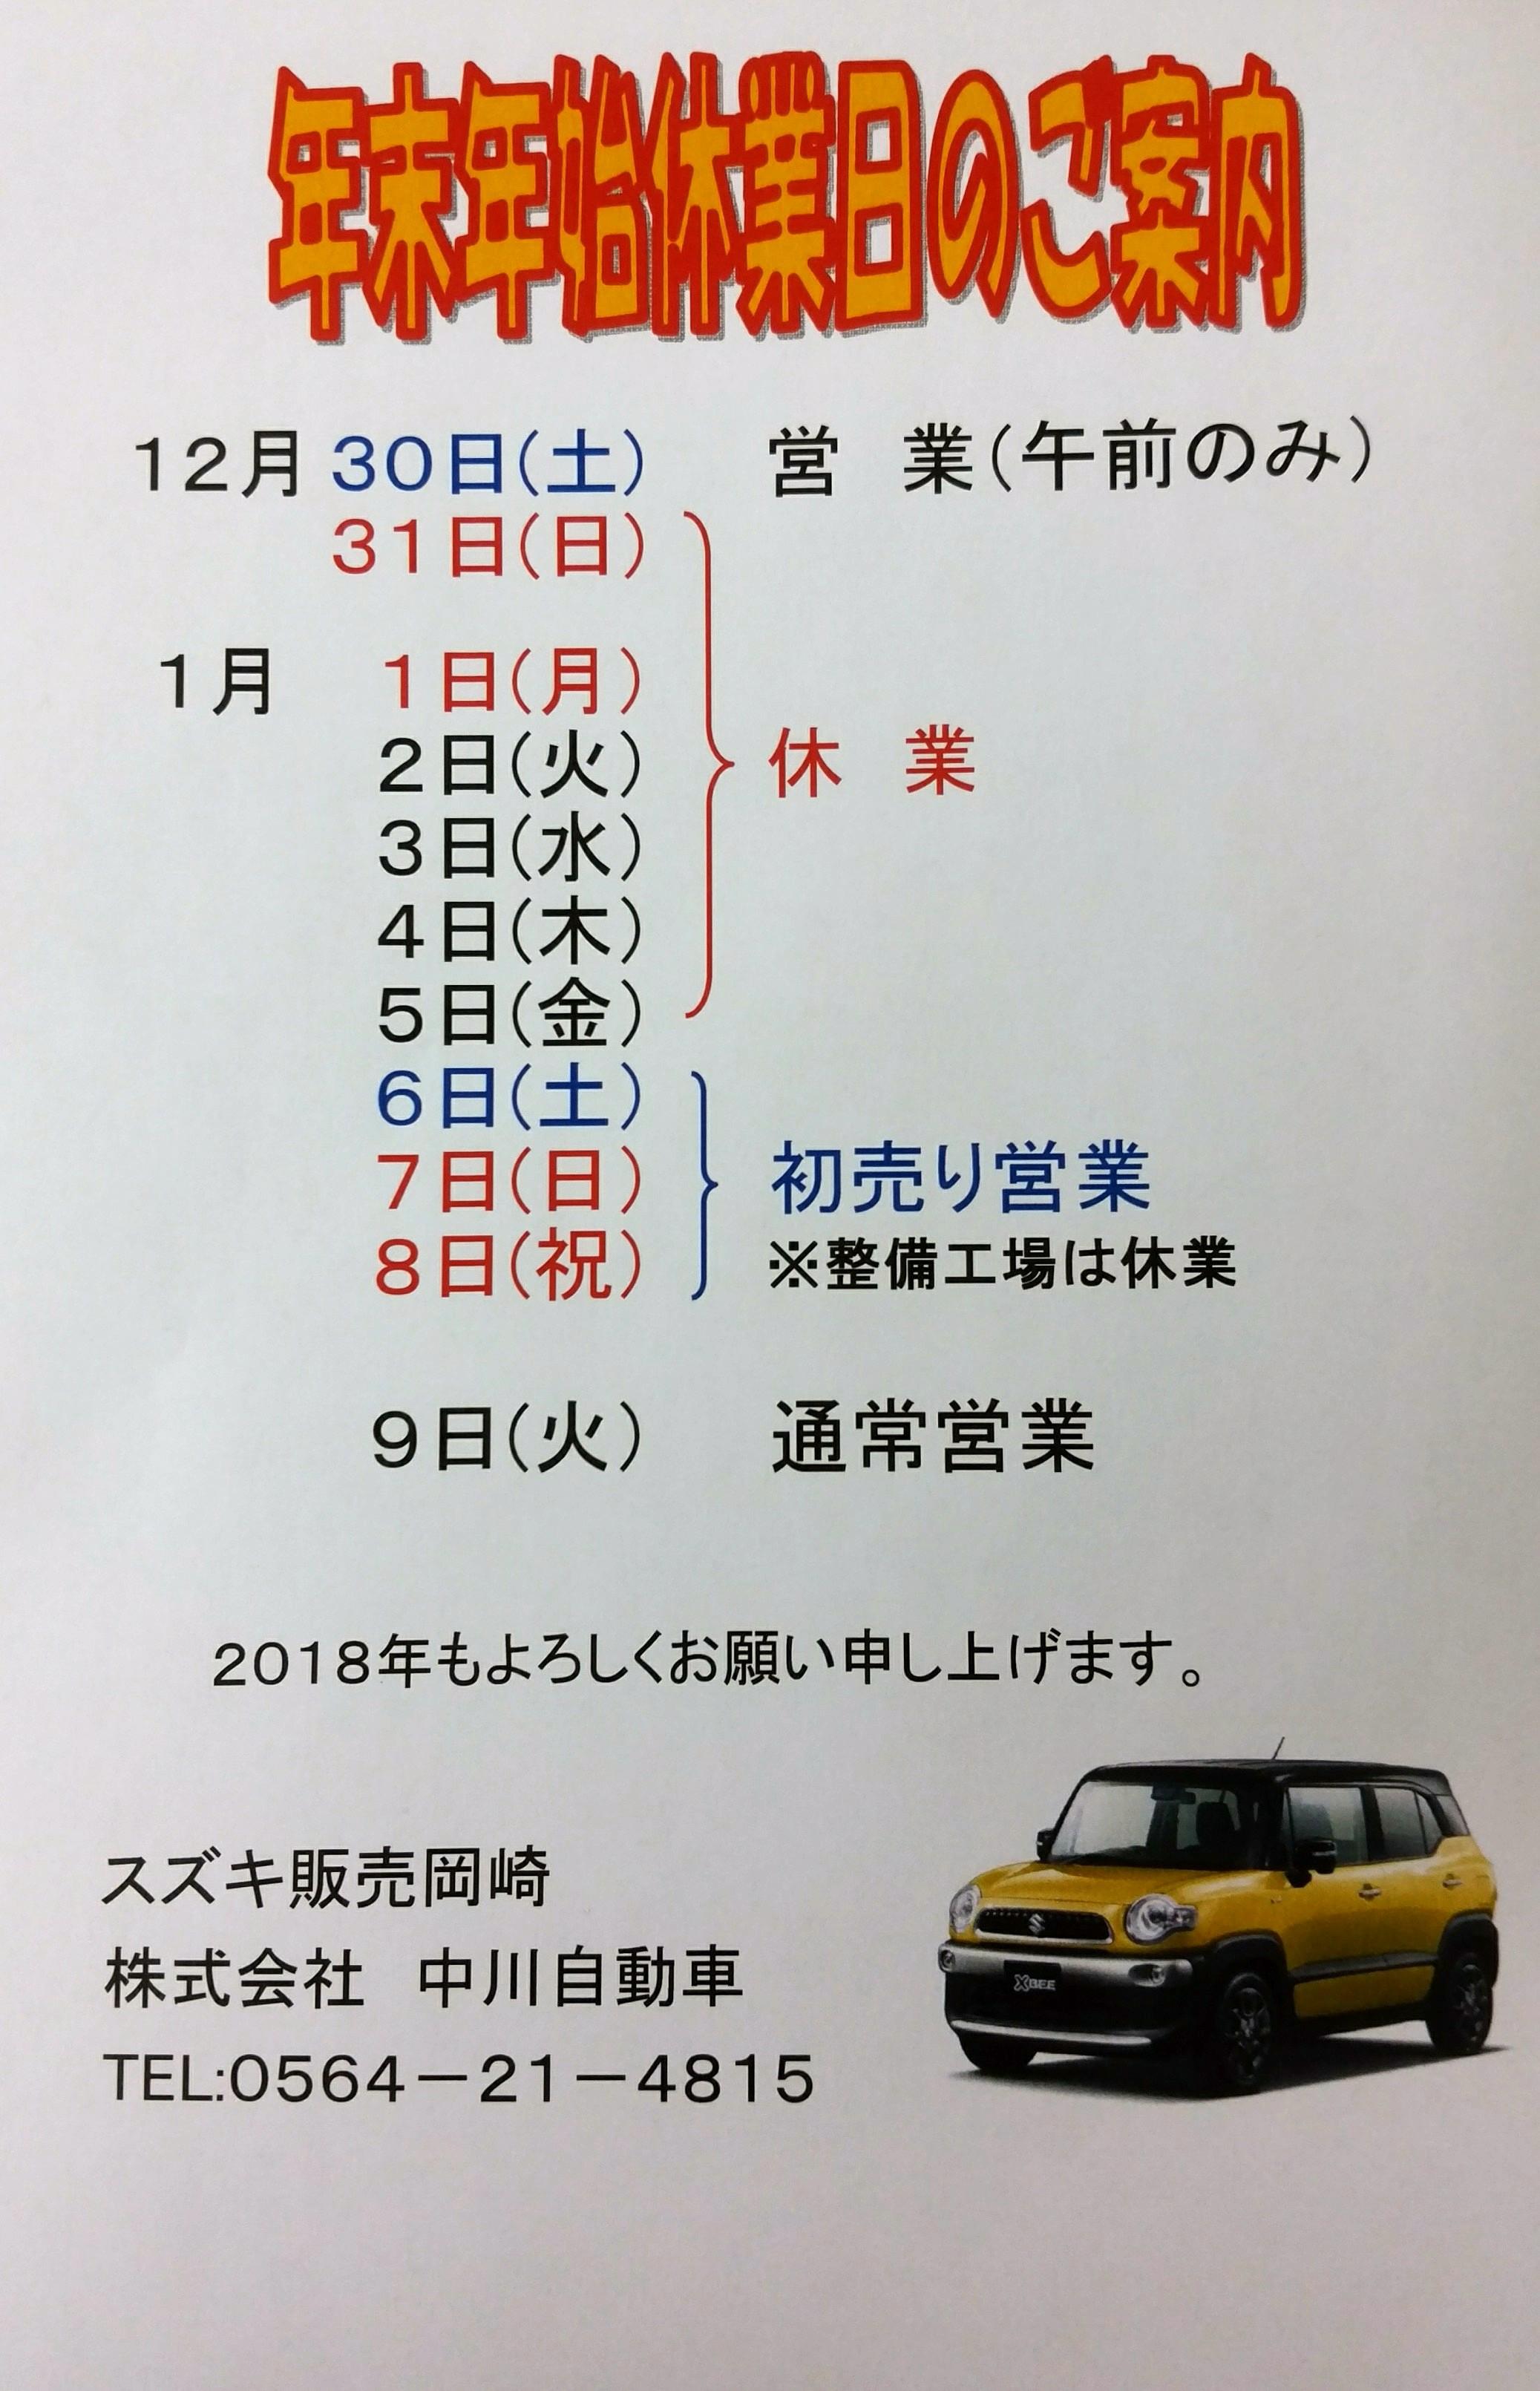 IMG_20171229_171336.jpg